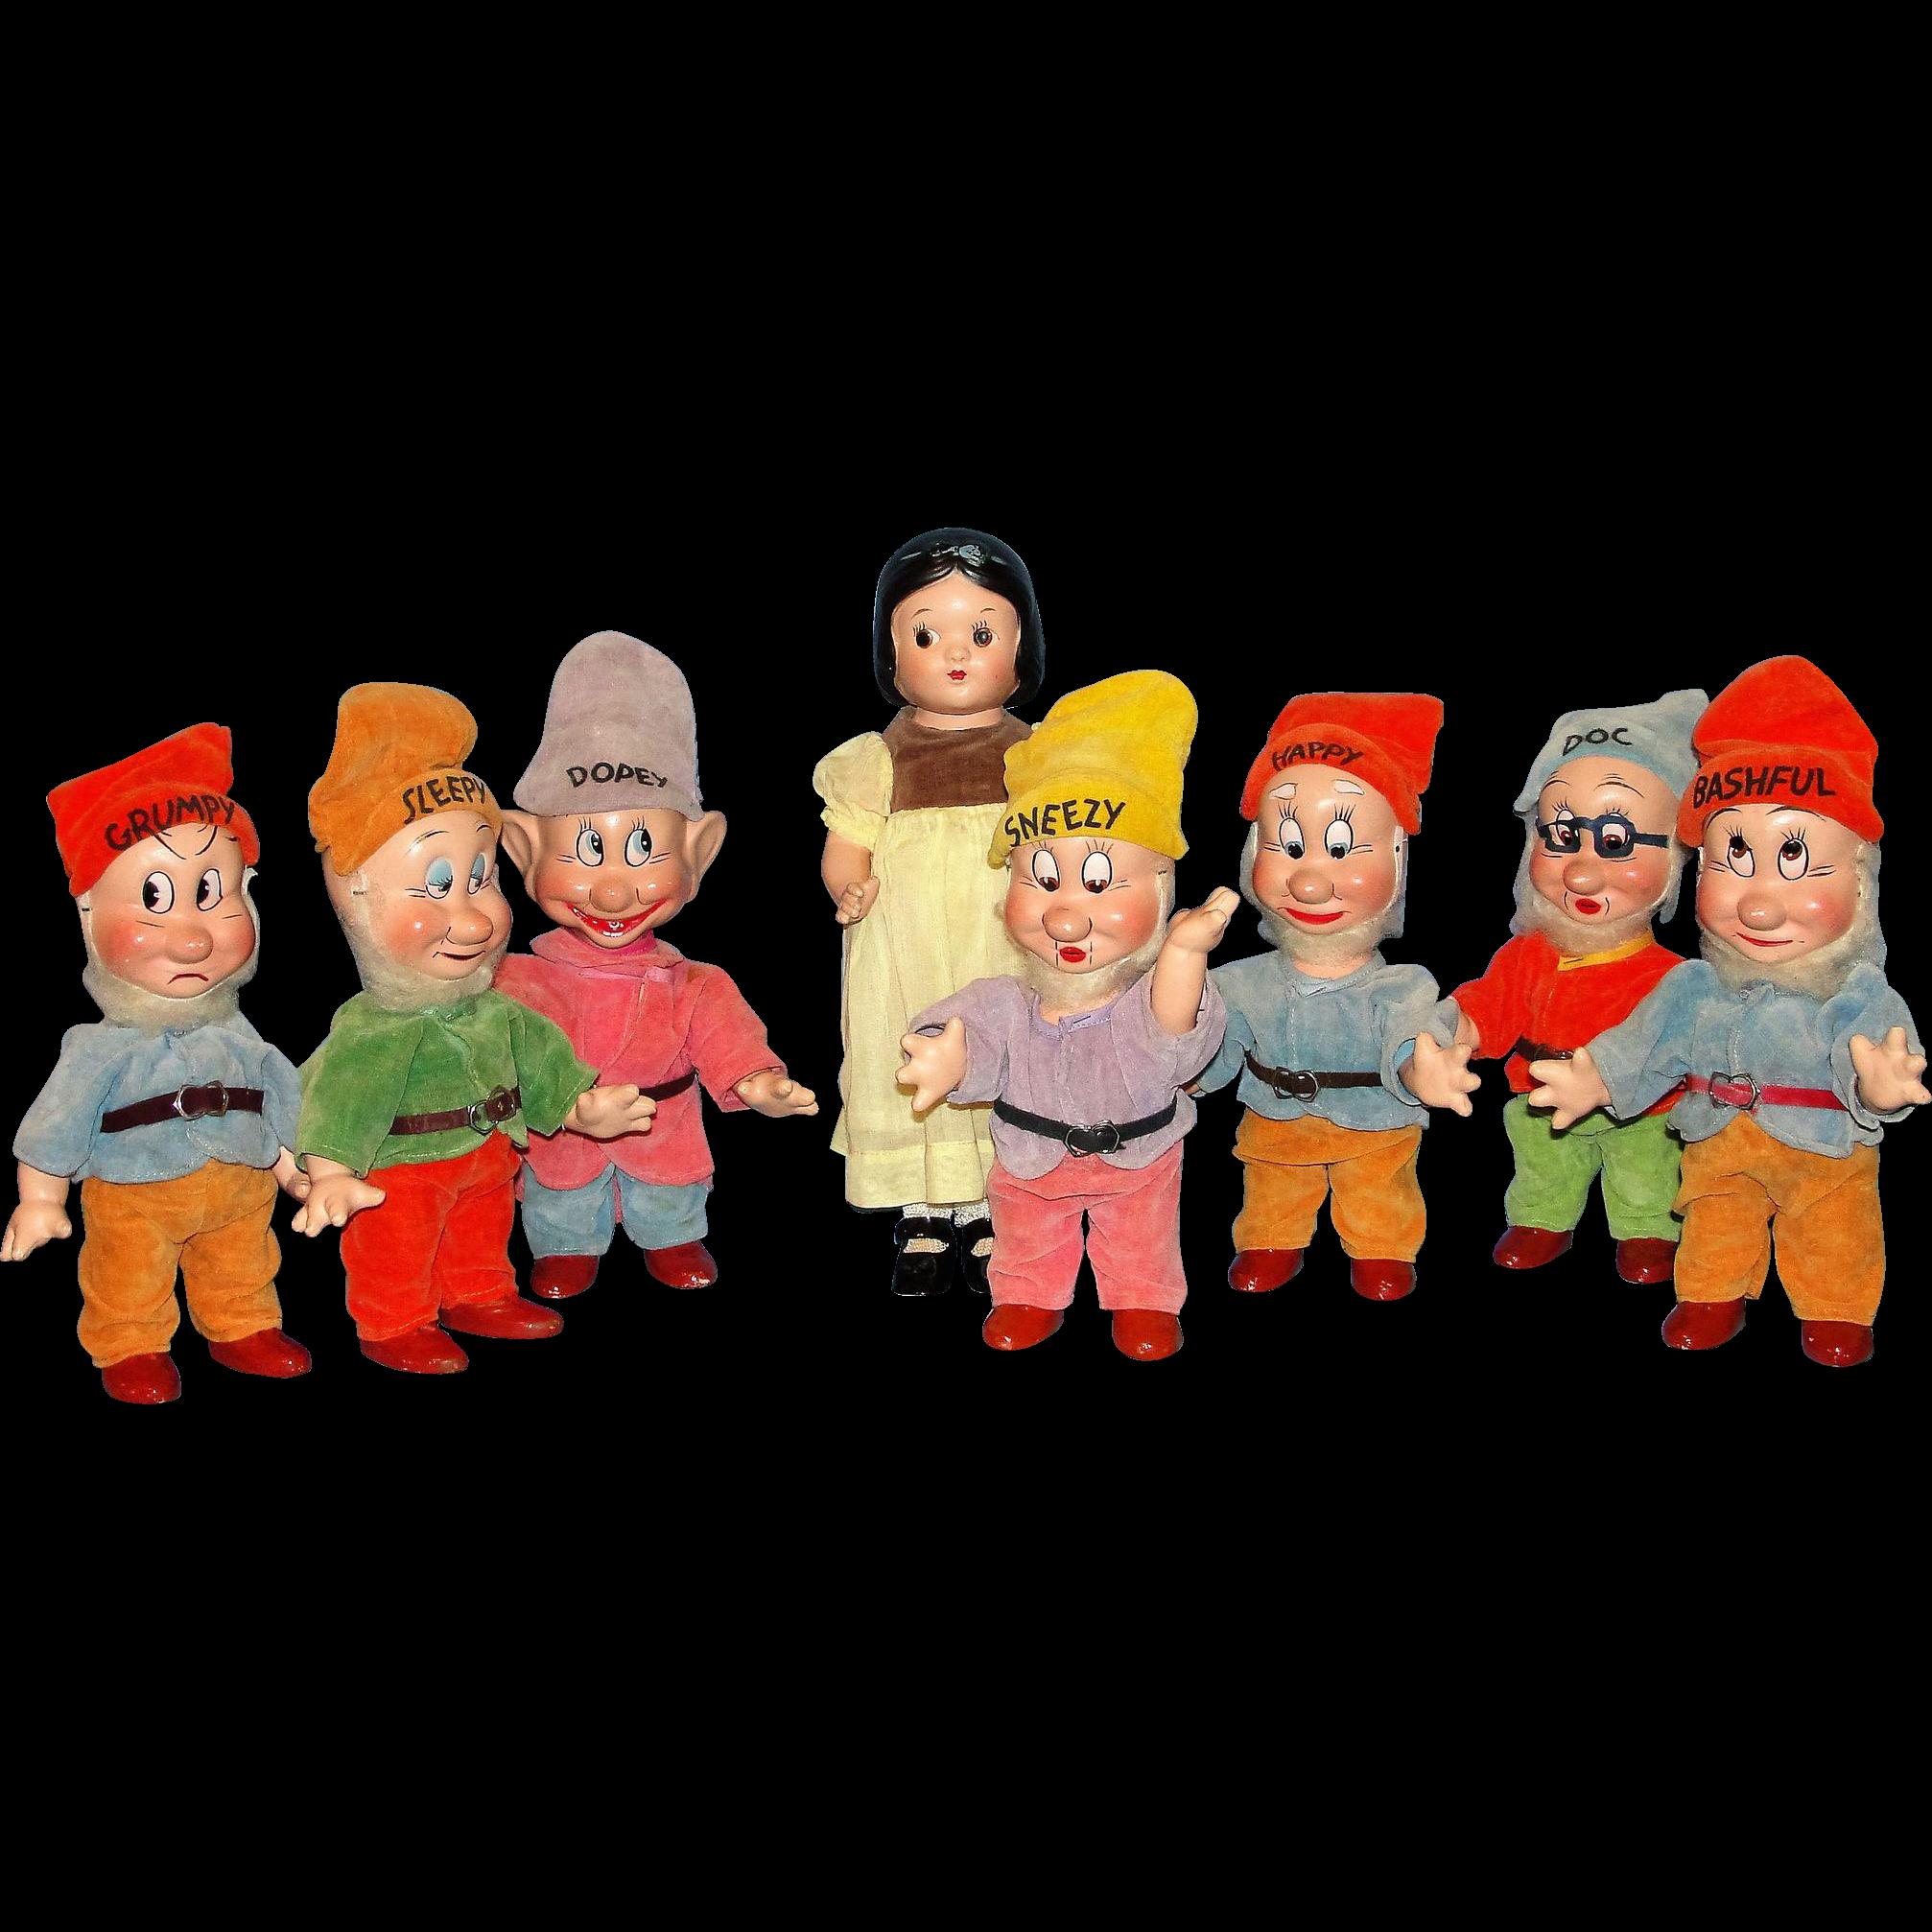 Houses clipart seven dwarfs. Extraordinary all original knickerbocker